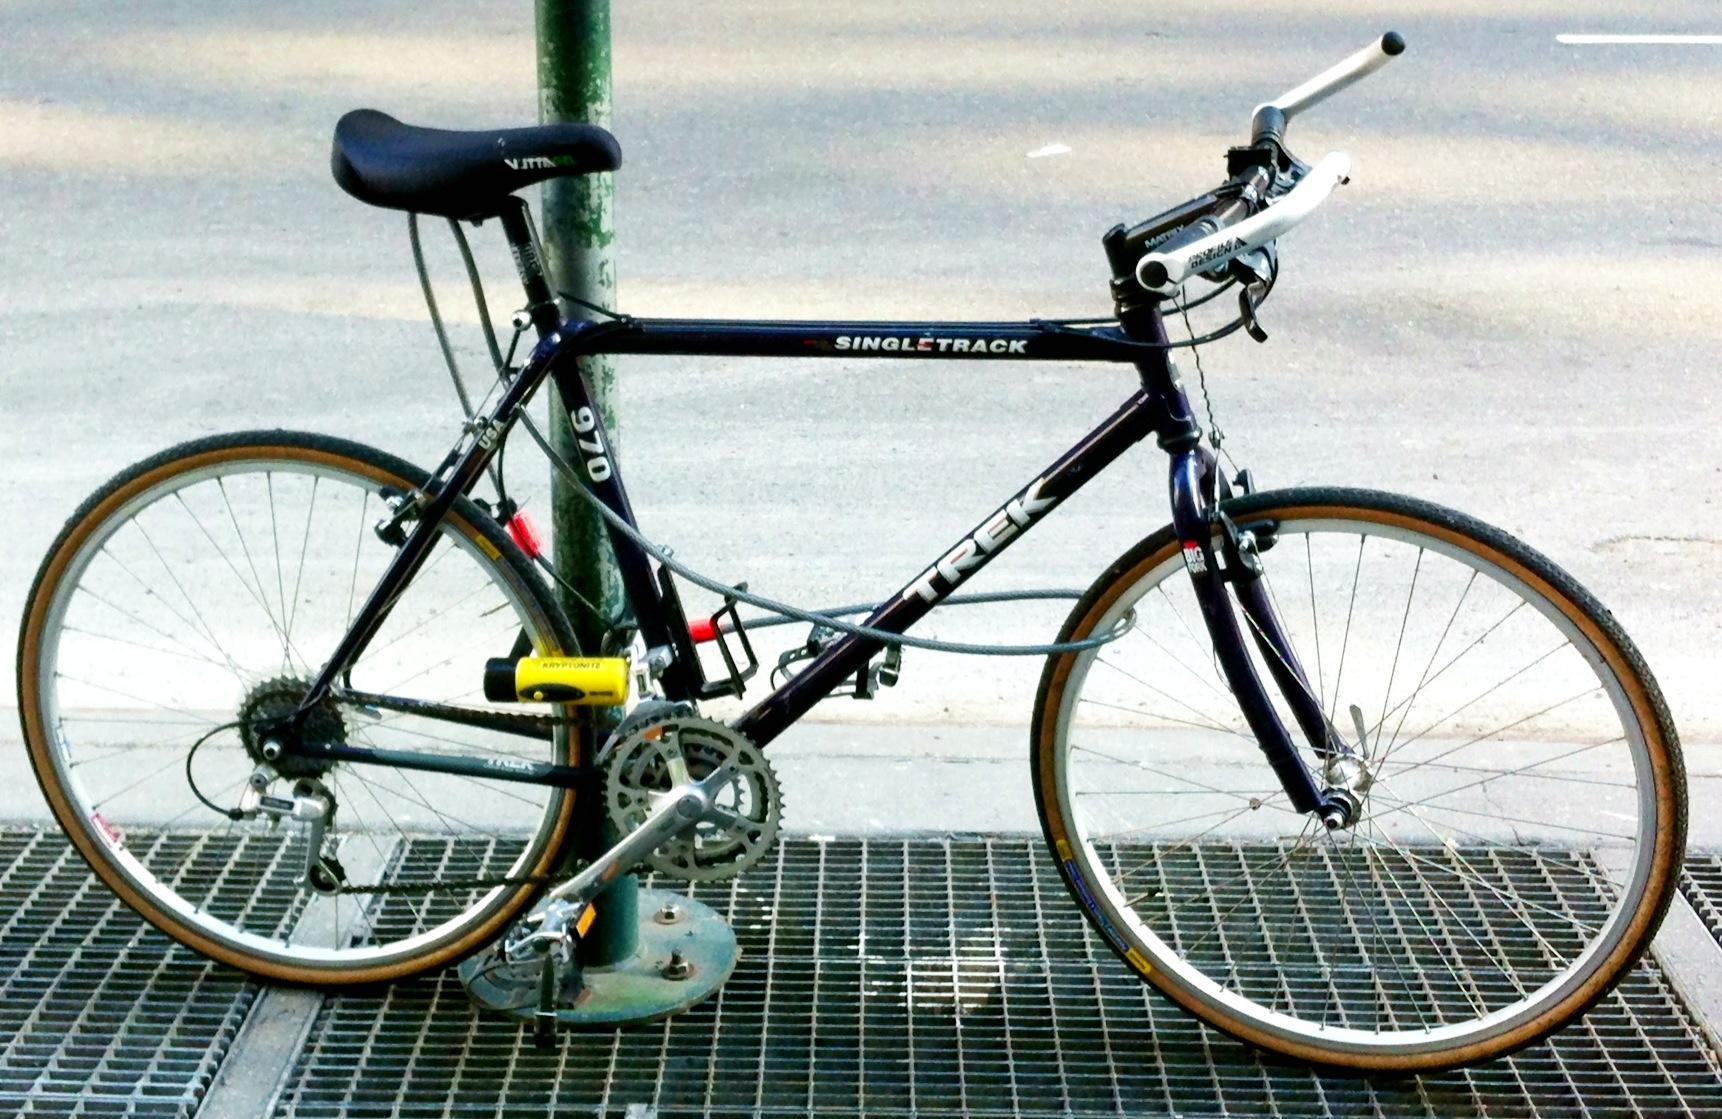 New ride: 1992 Trek 970 Singletrack – Adam Kuban